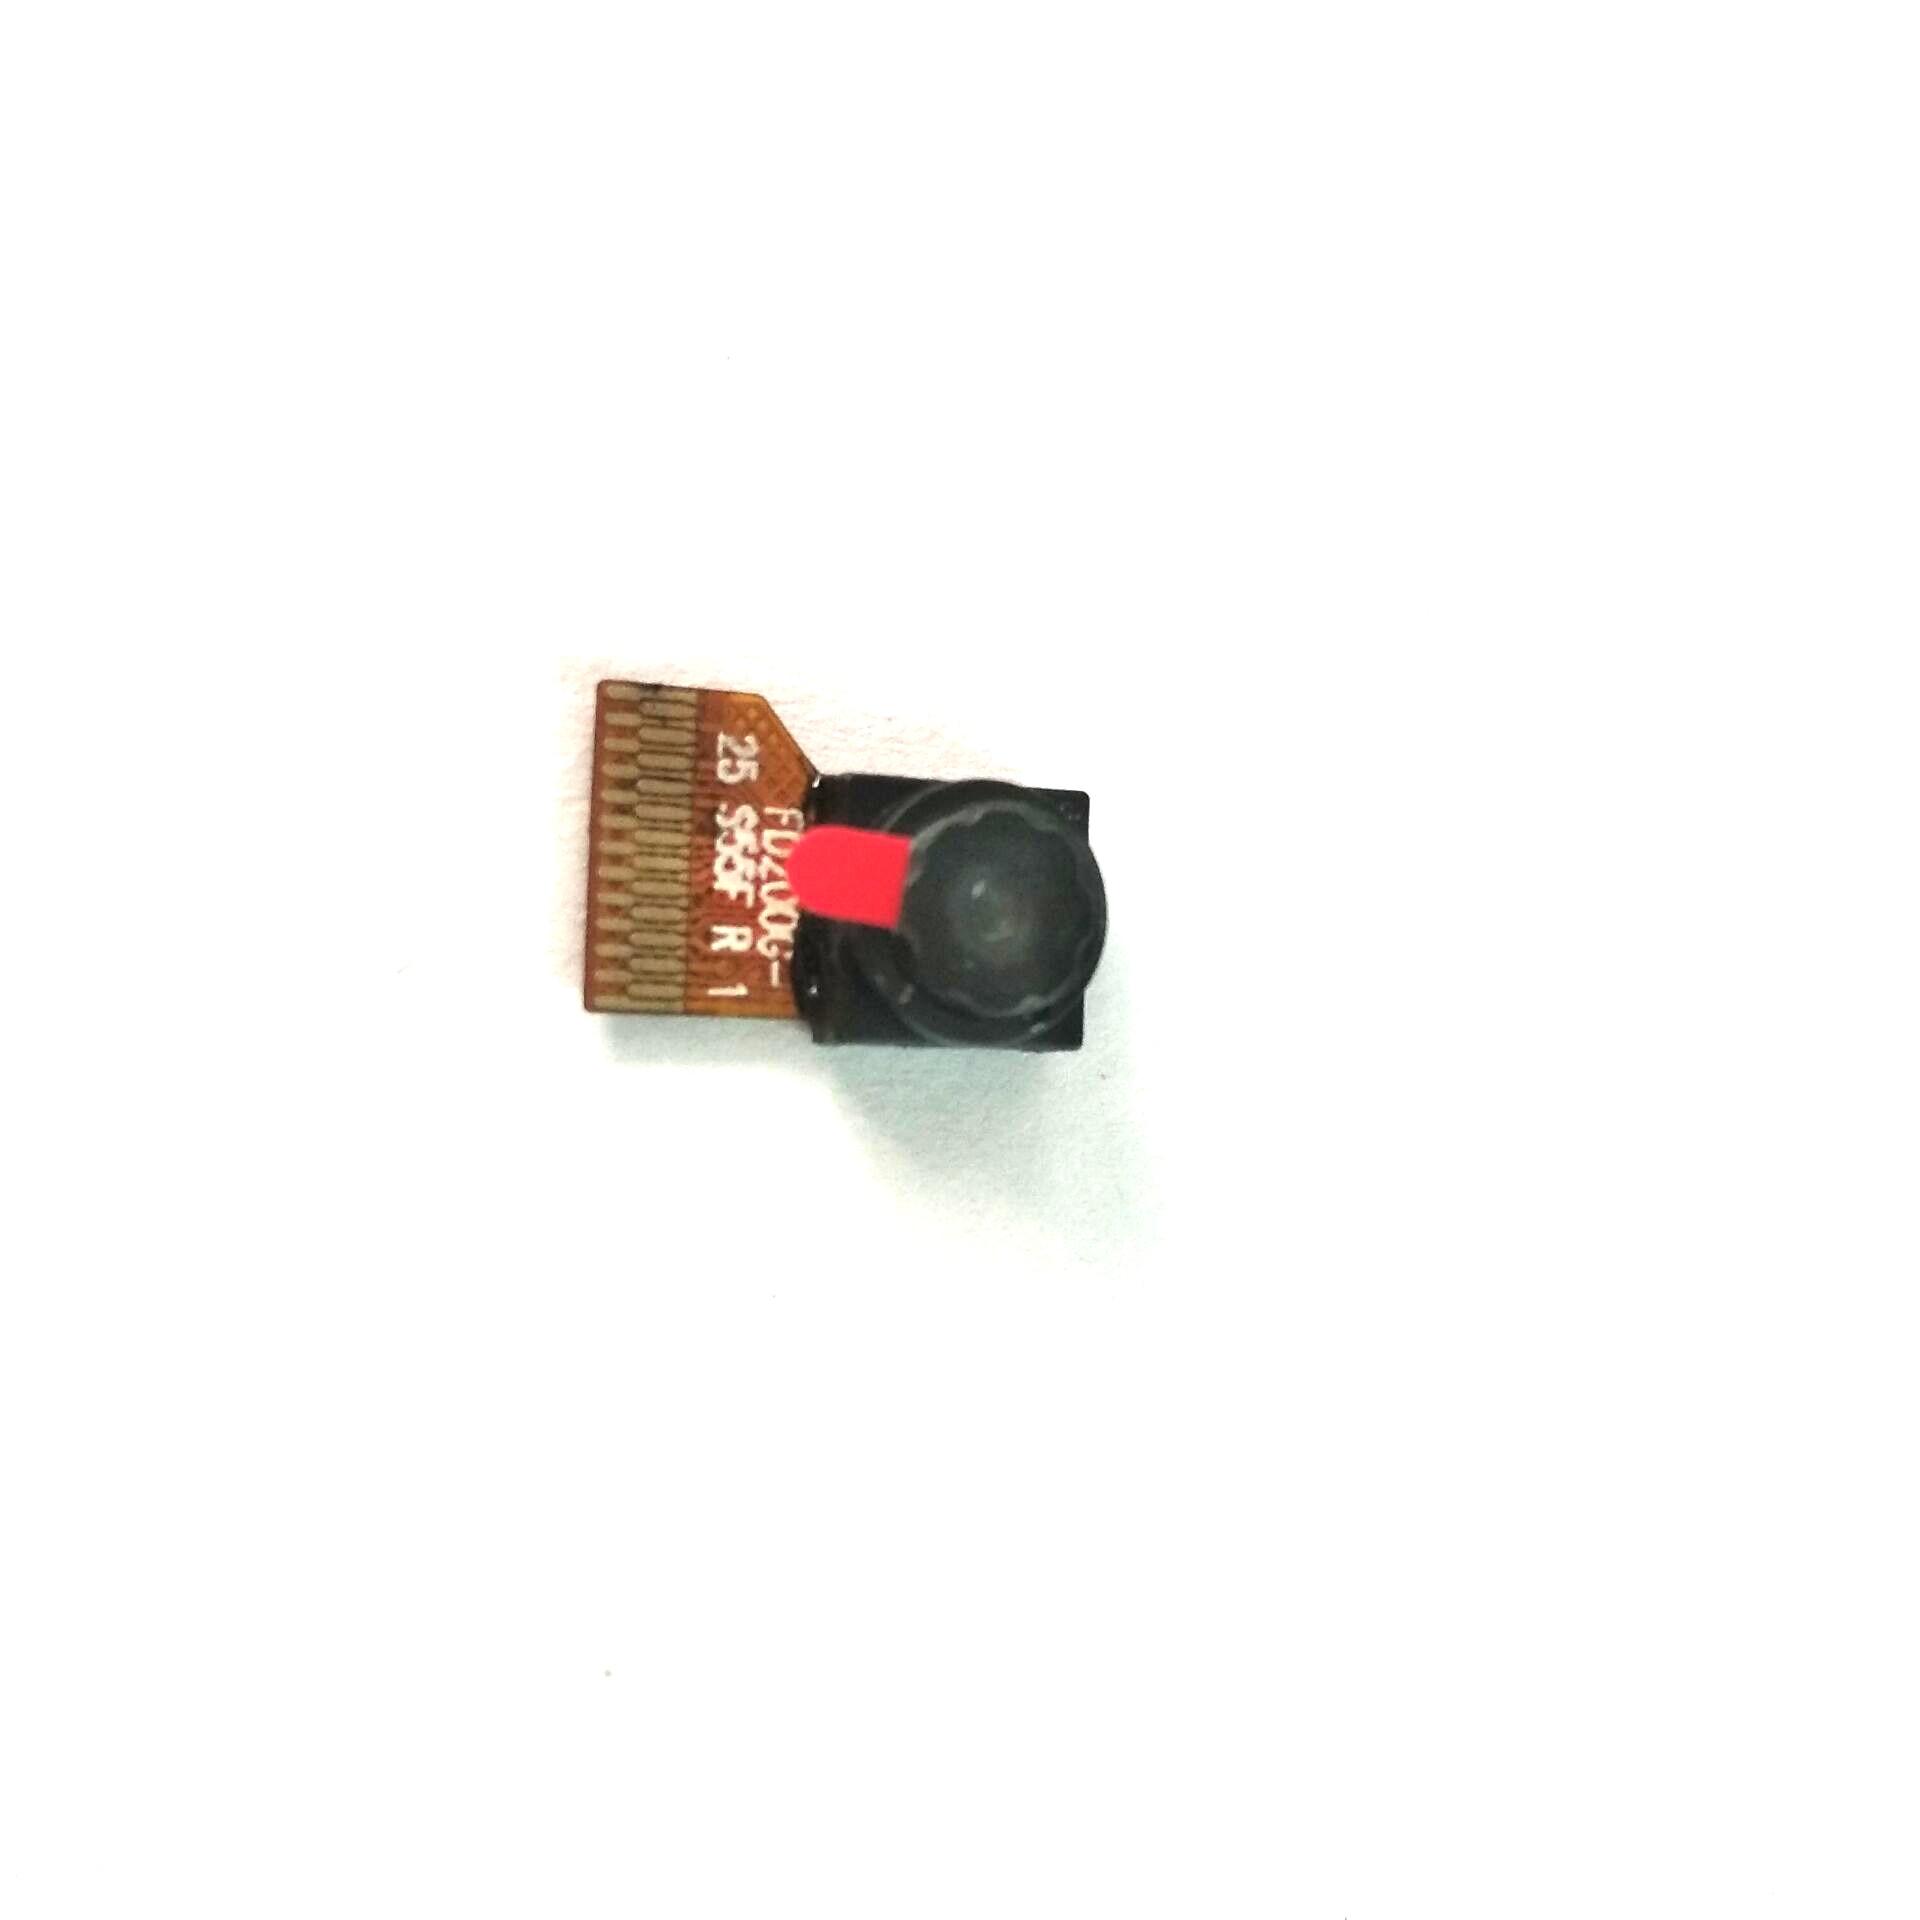 Original Photo Front Camera Module for Oukitel C11 Free shipping